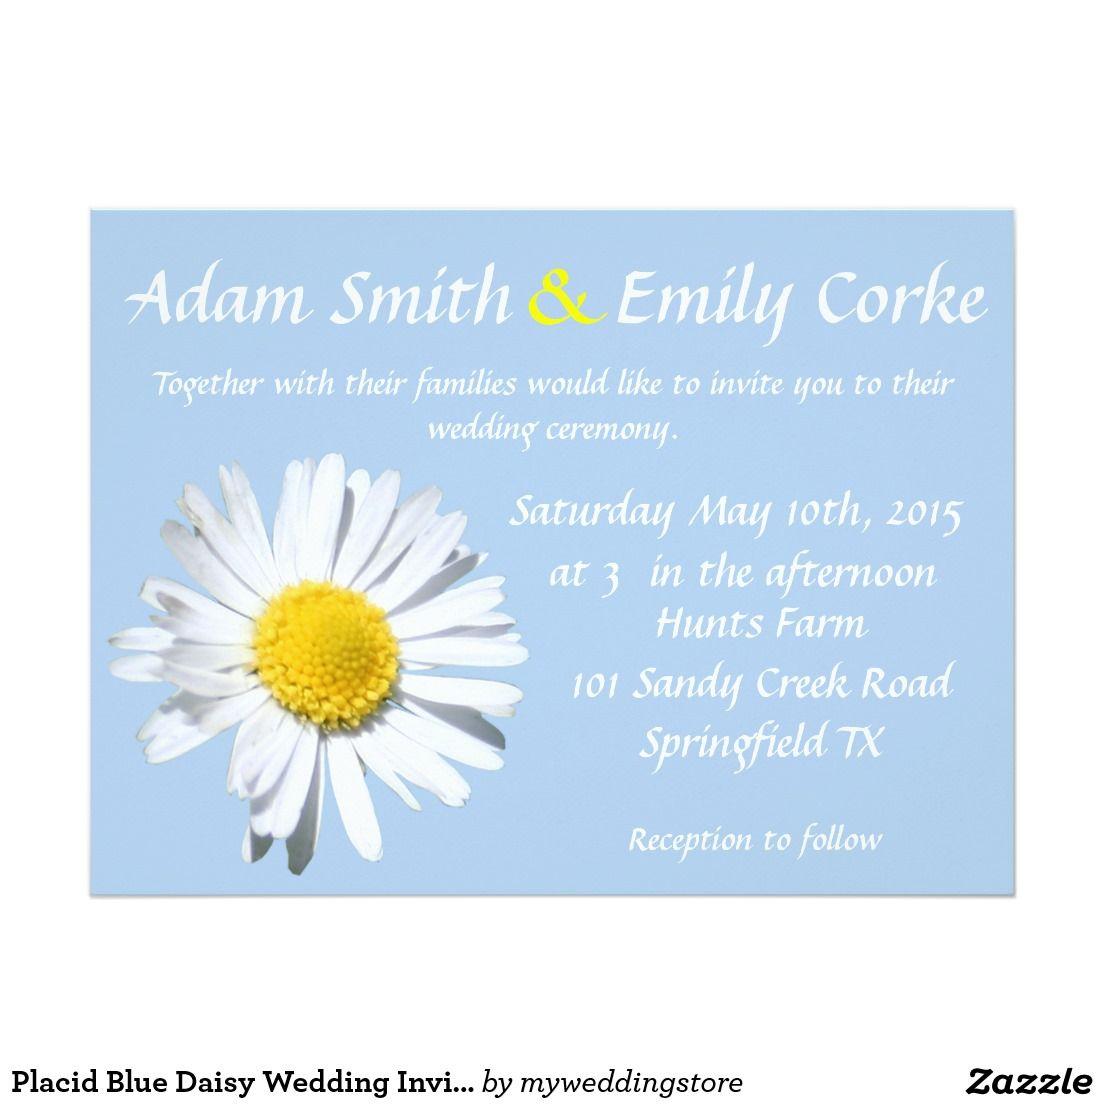 placid blue daisy wedding invitation daisy wedding zazzle